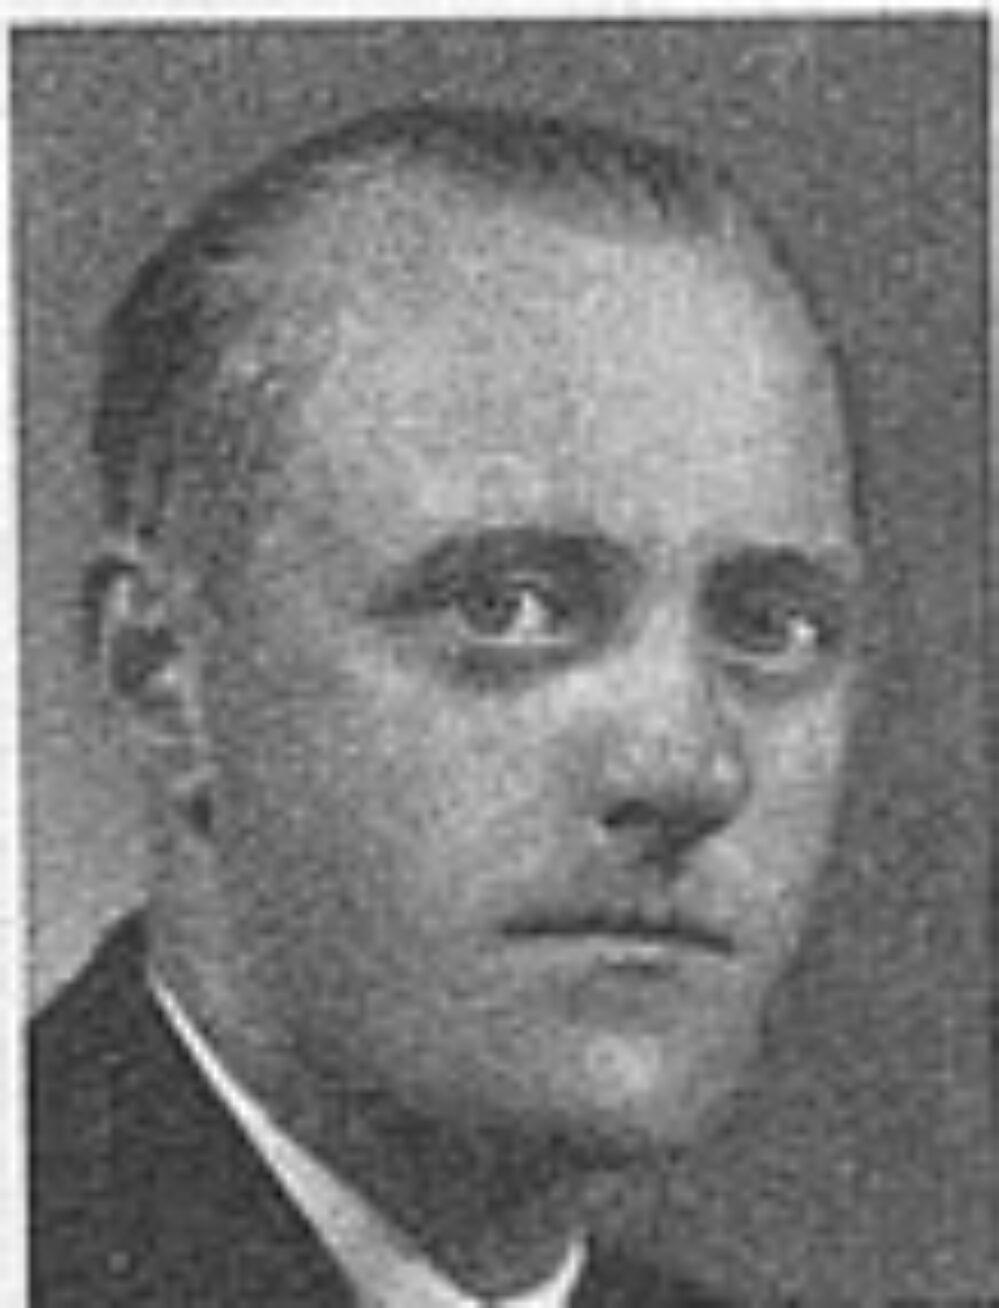 Hjalmar Børsholm